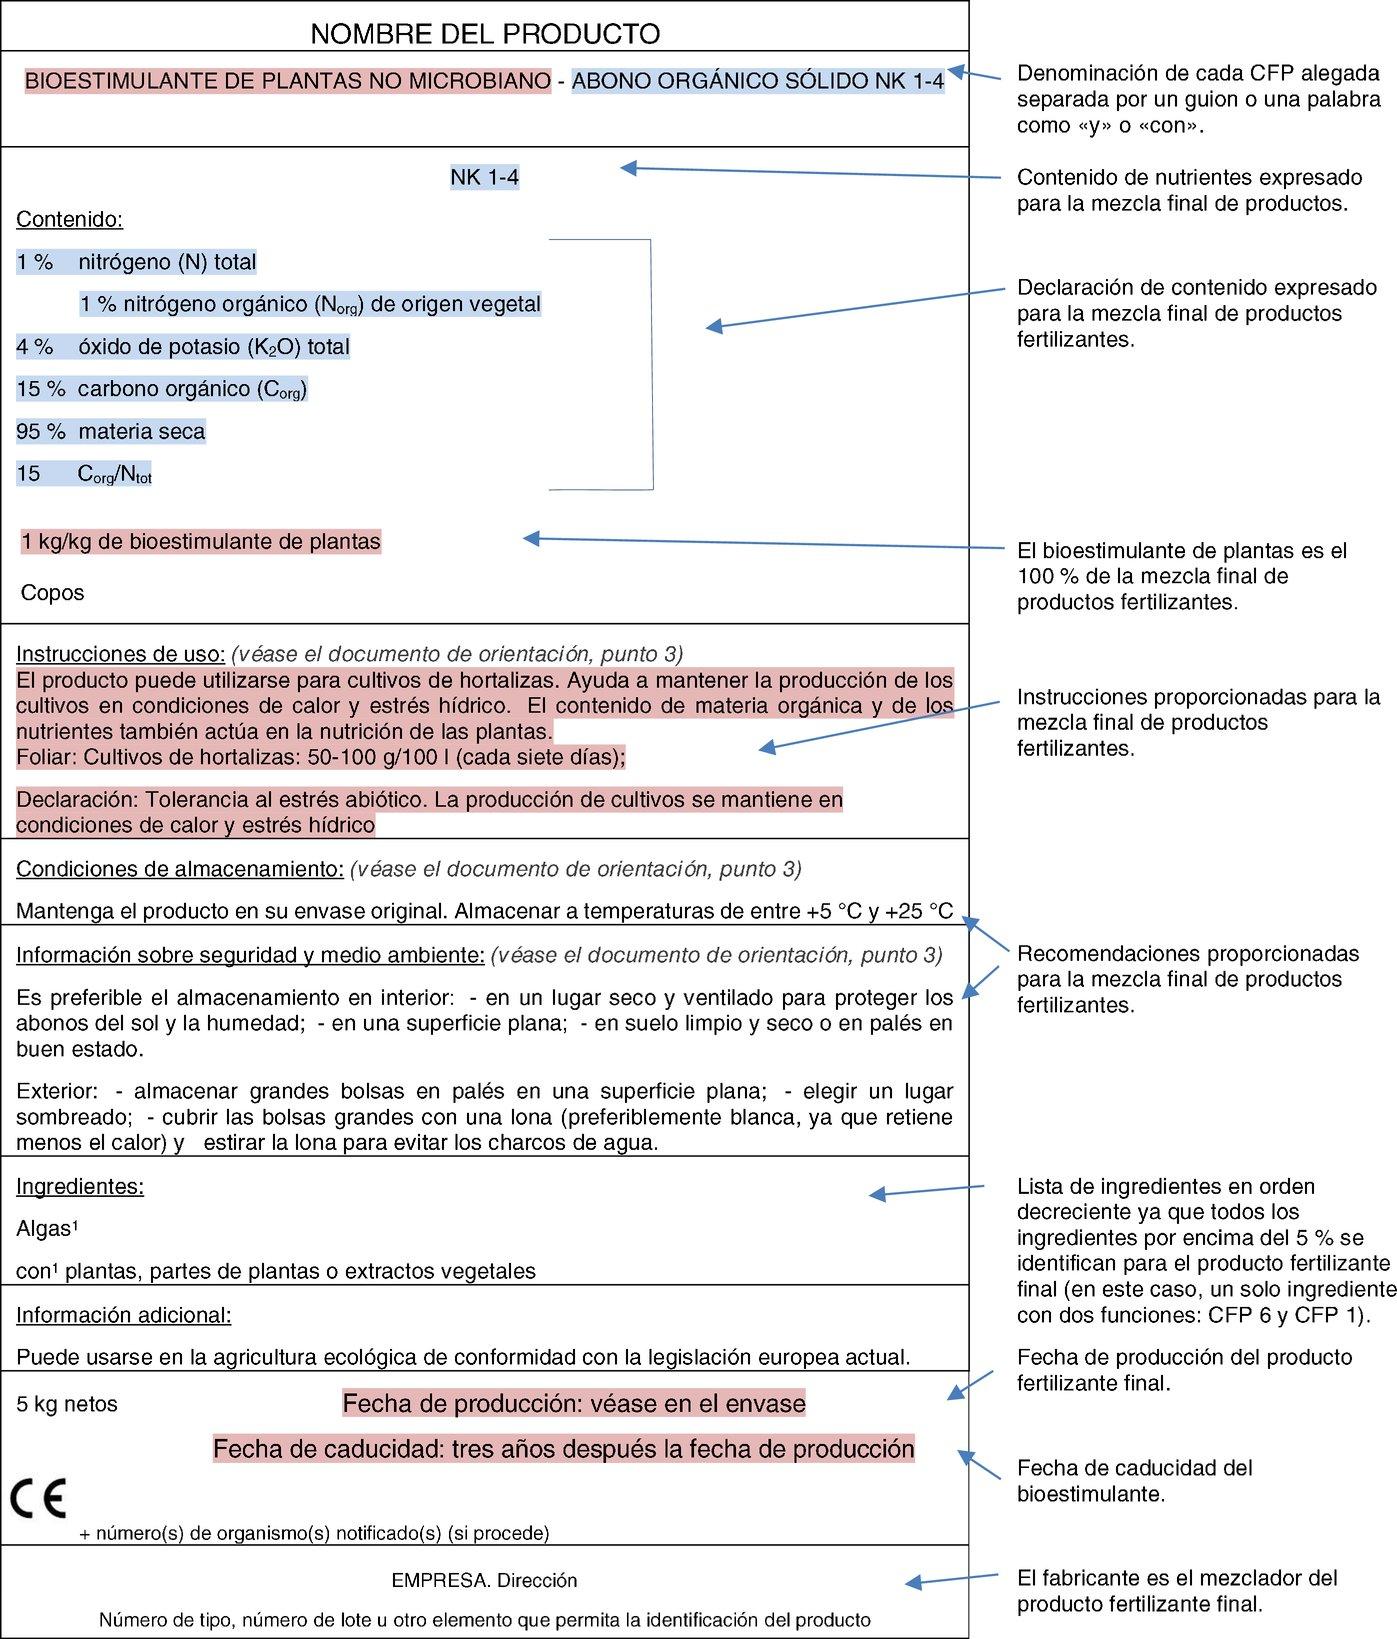 Imagen: http://publications.europa.eu/resource/uriserv/OJ.C_.2021.119.01.0001.01.SPA.xhtml.C_2021119ES.01004301.tif.jpg